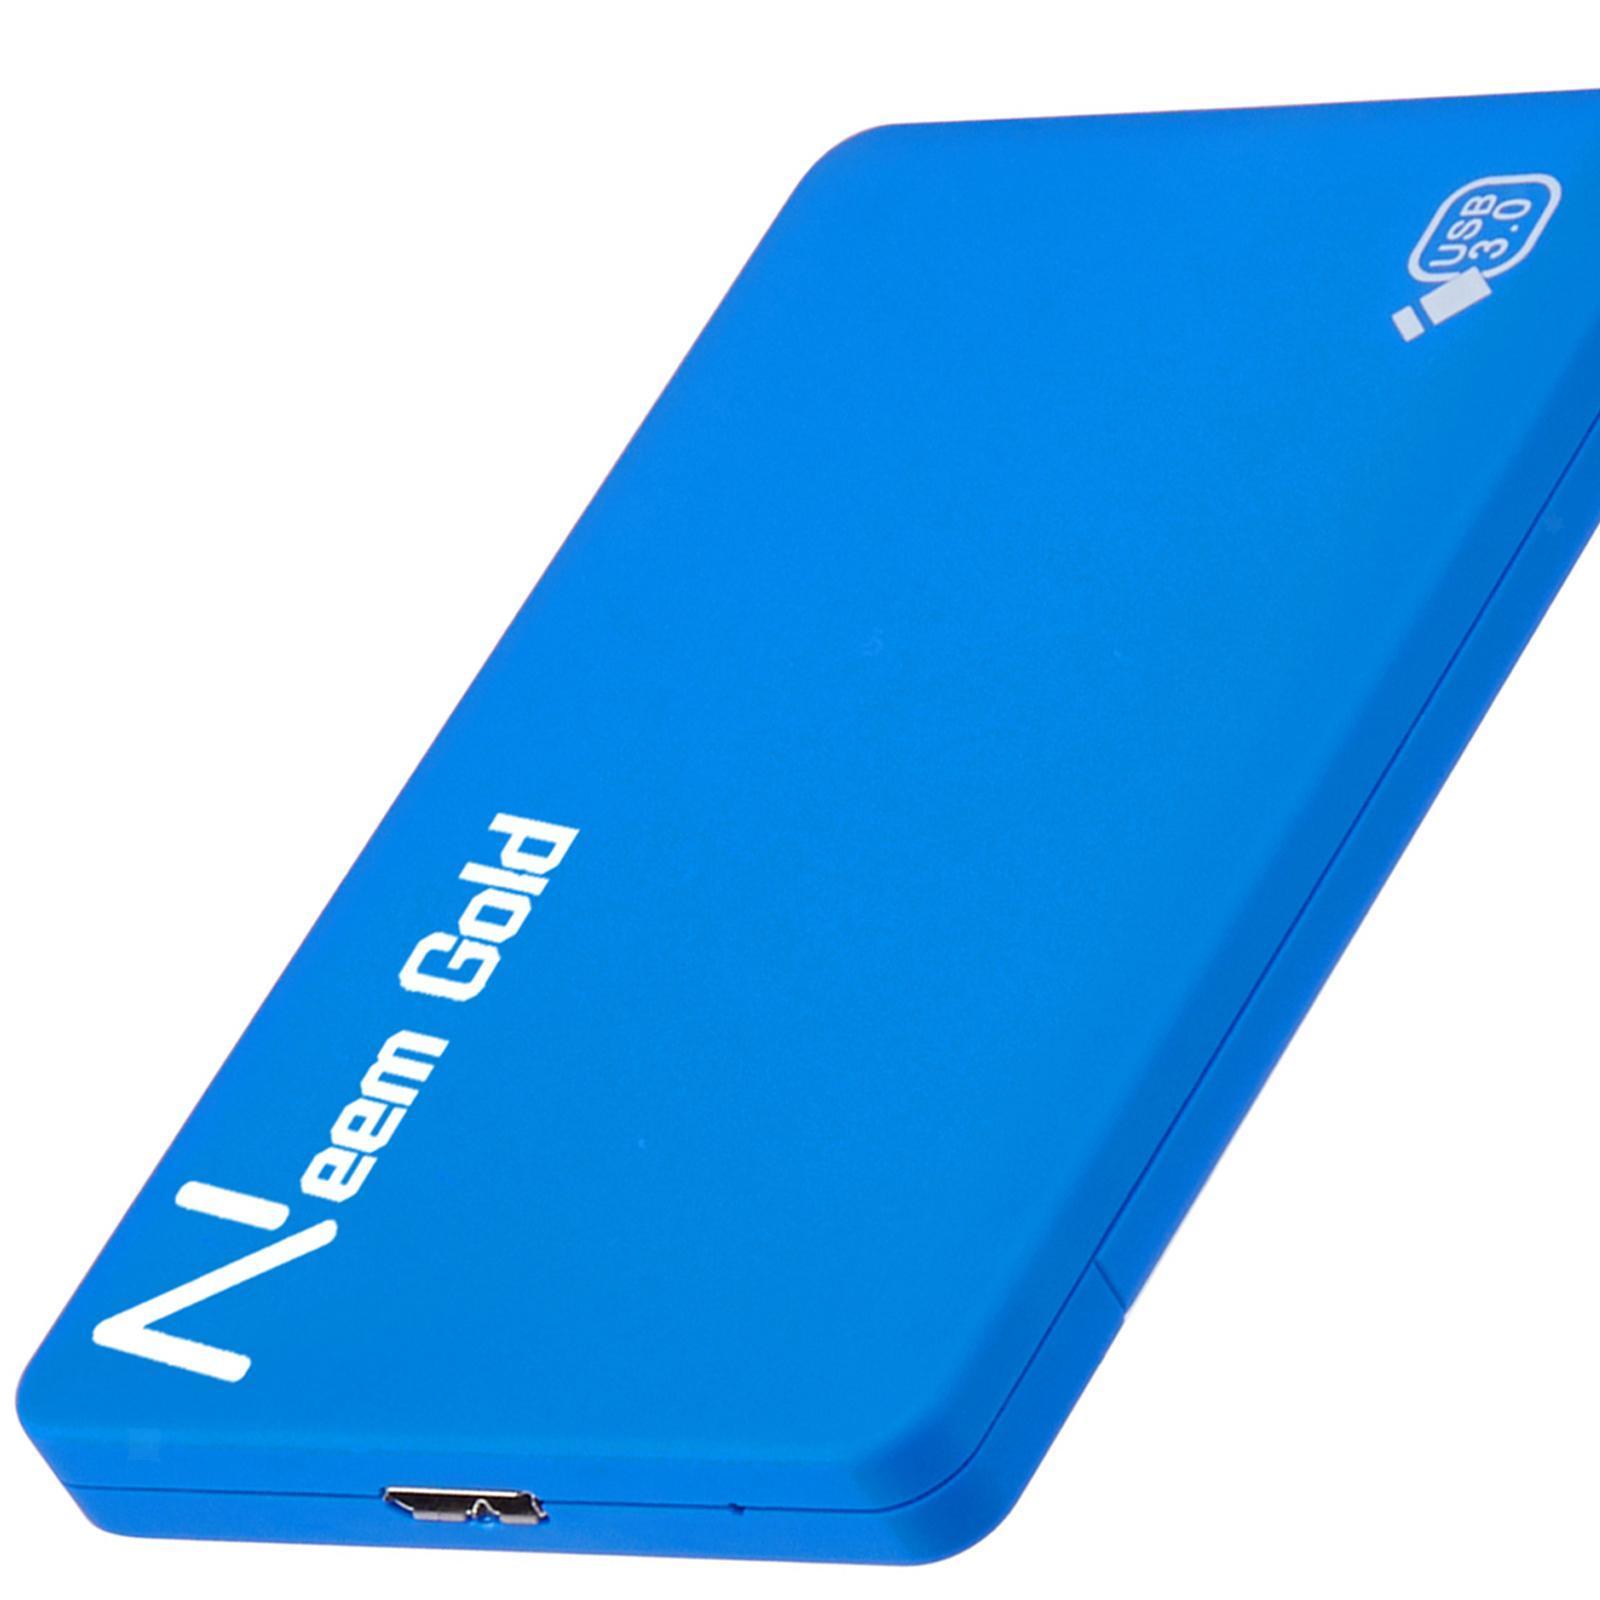 miniature 10 - ABS External Portable USB 3.0 Hard Drive Disk HDD for Desktop Laptop New